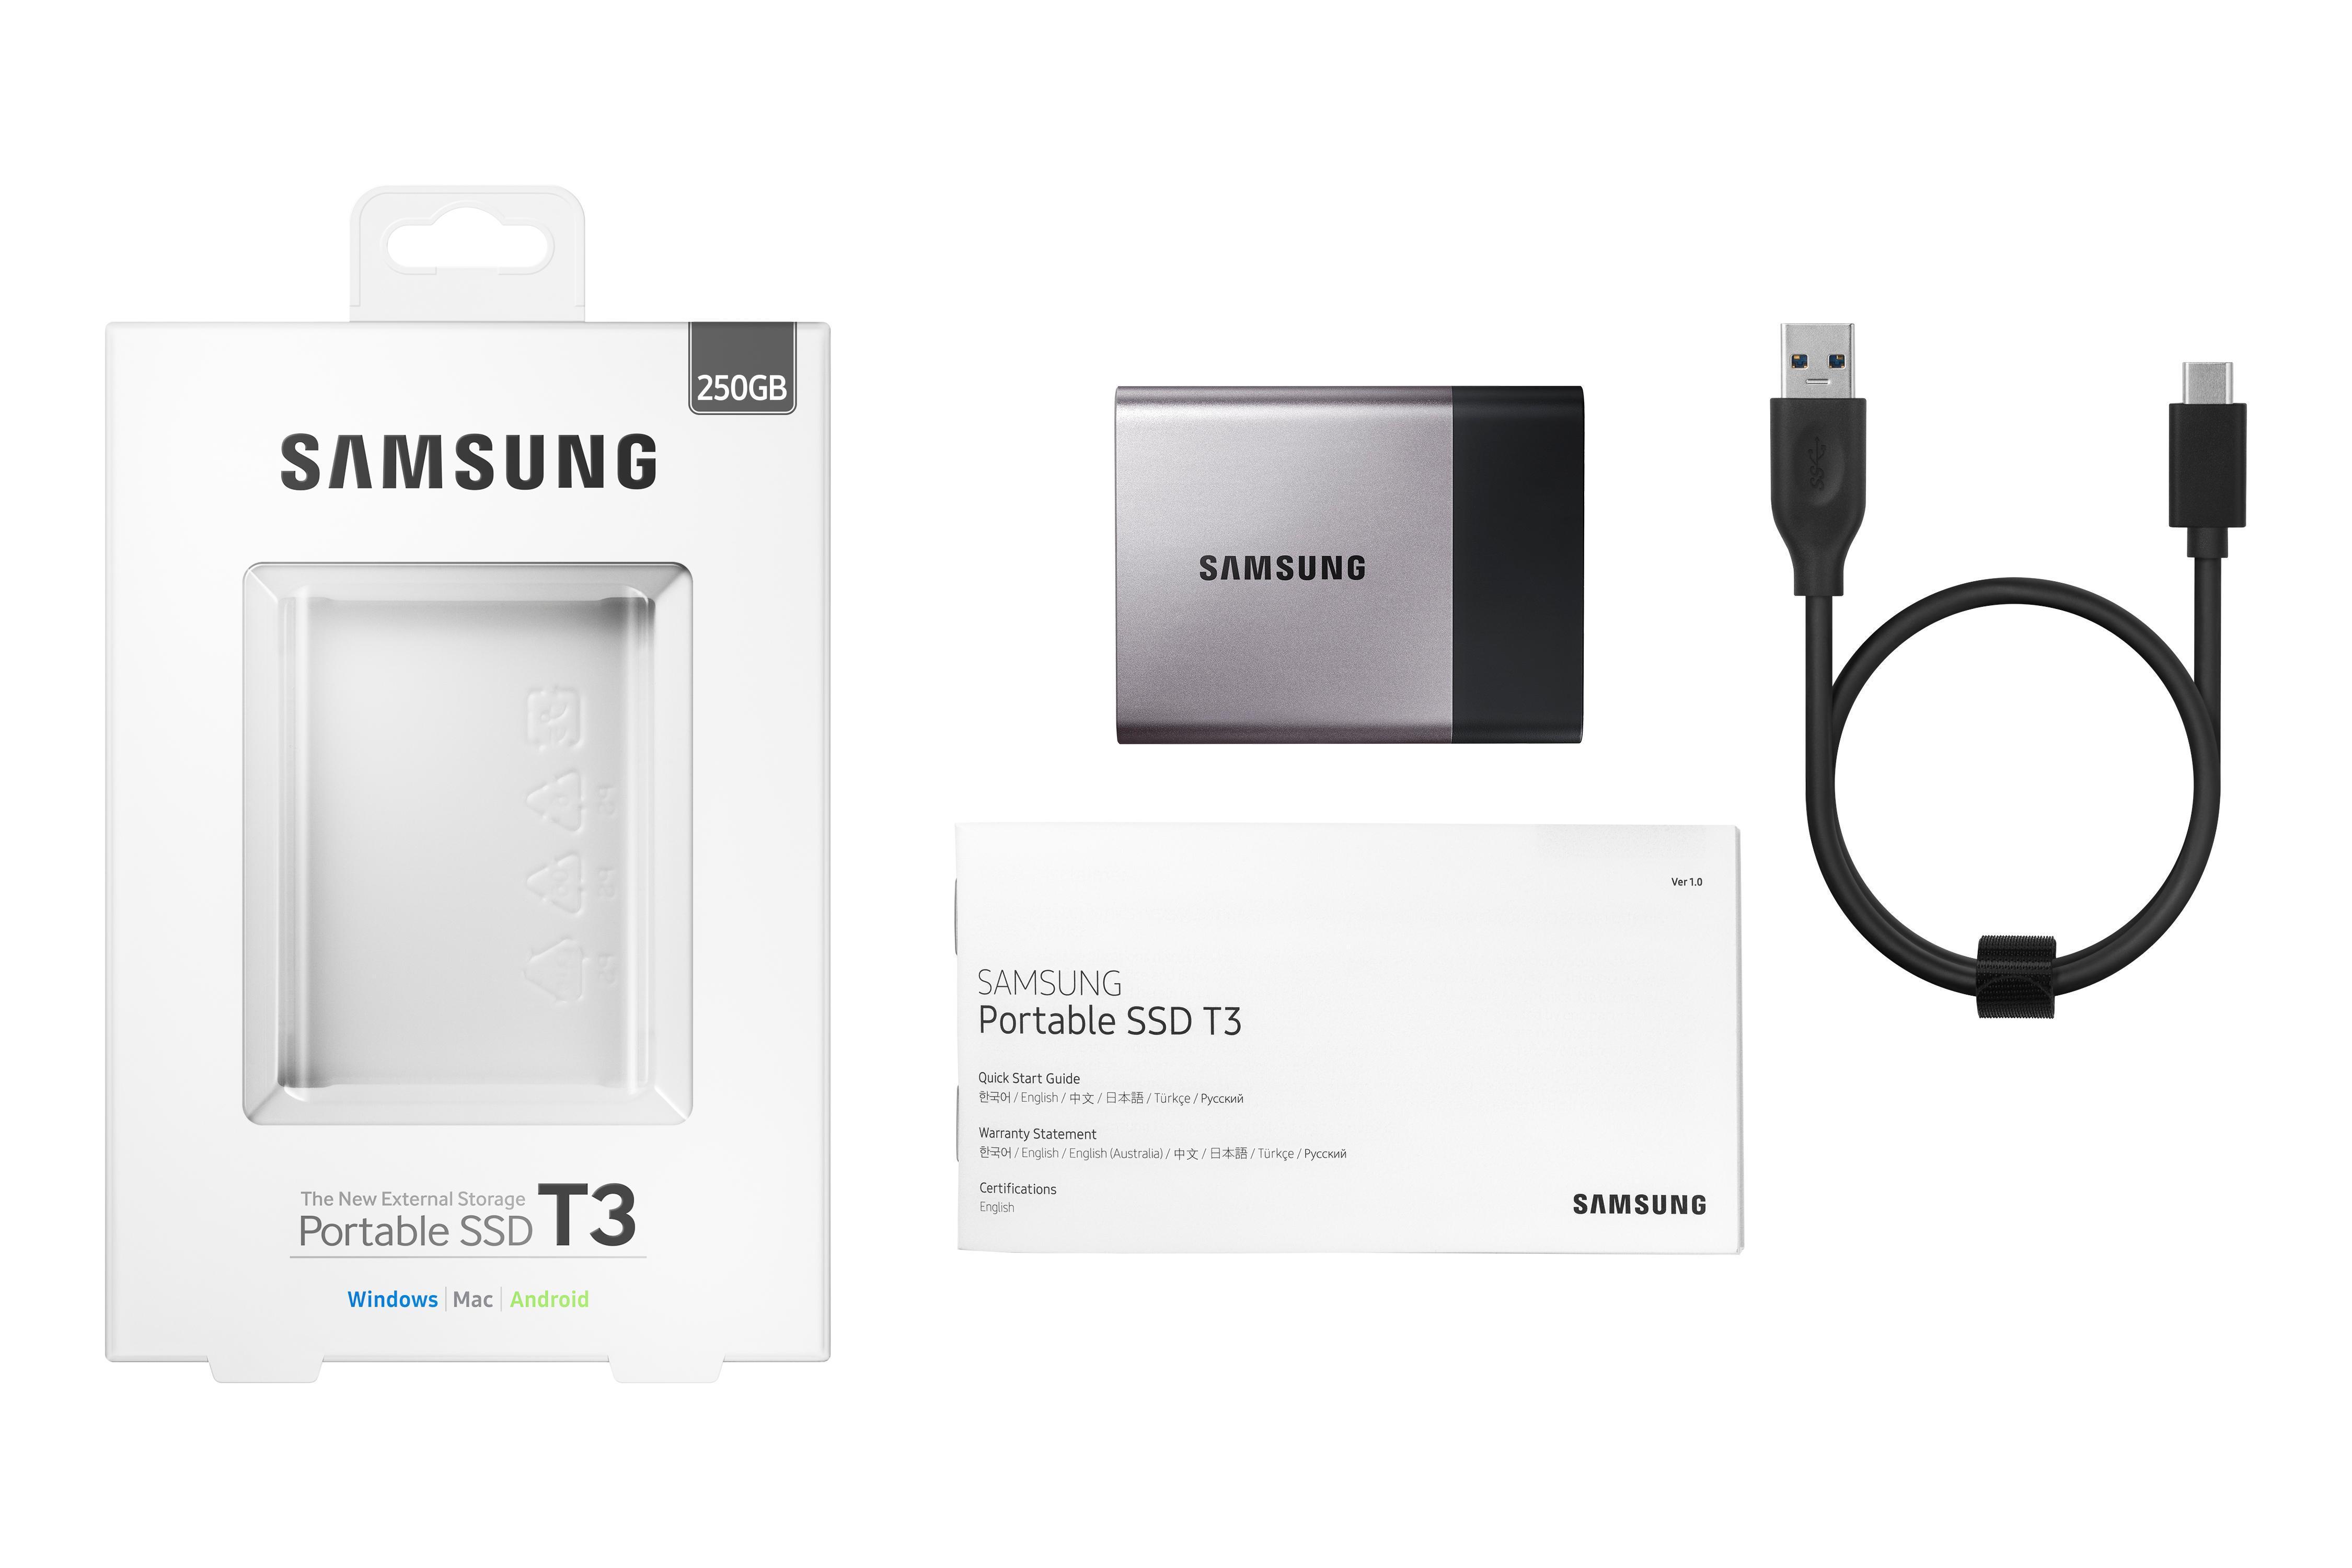 Amazon.com: Samsung T3 Portable SSD - 250GB - USB 3.1 ...